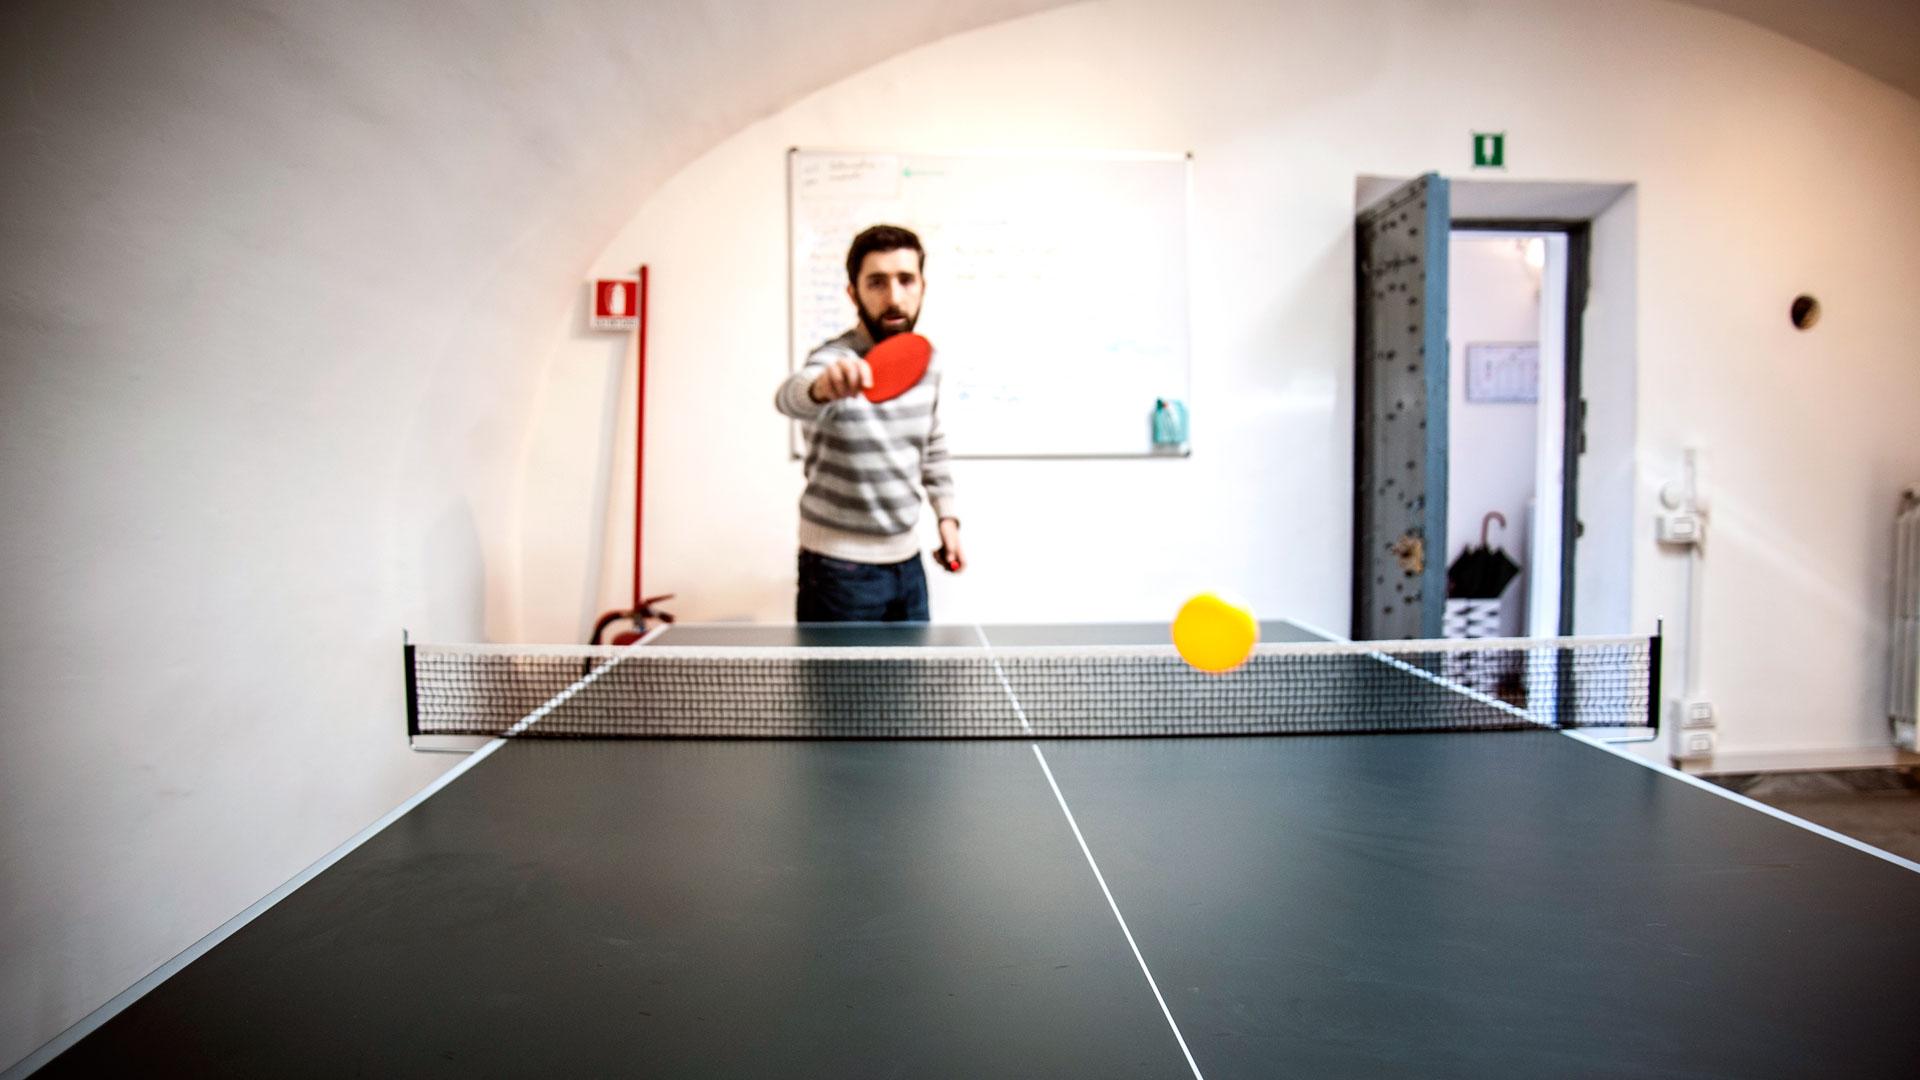 Sala 1 Ping Pong